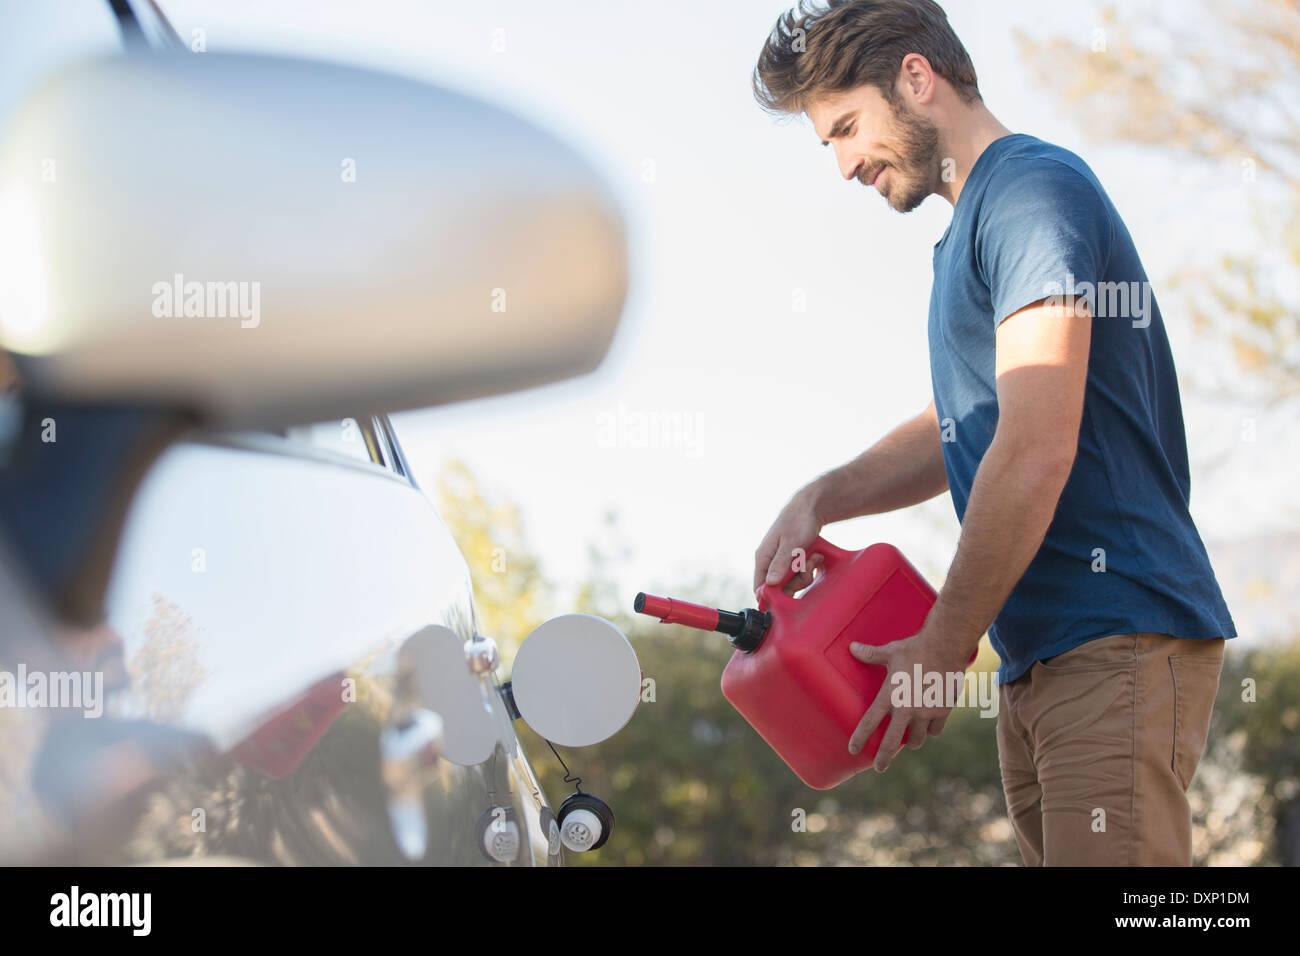 Man filling gas tank at roadside - Stock Image